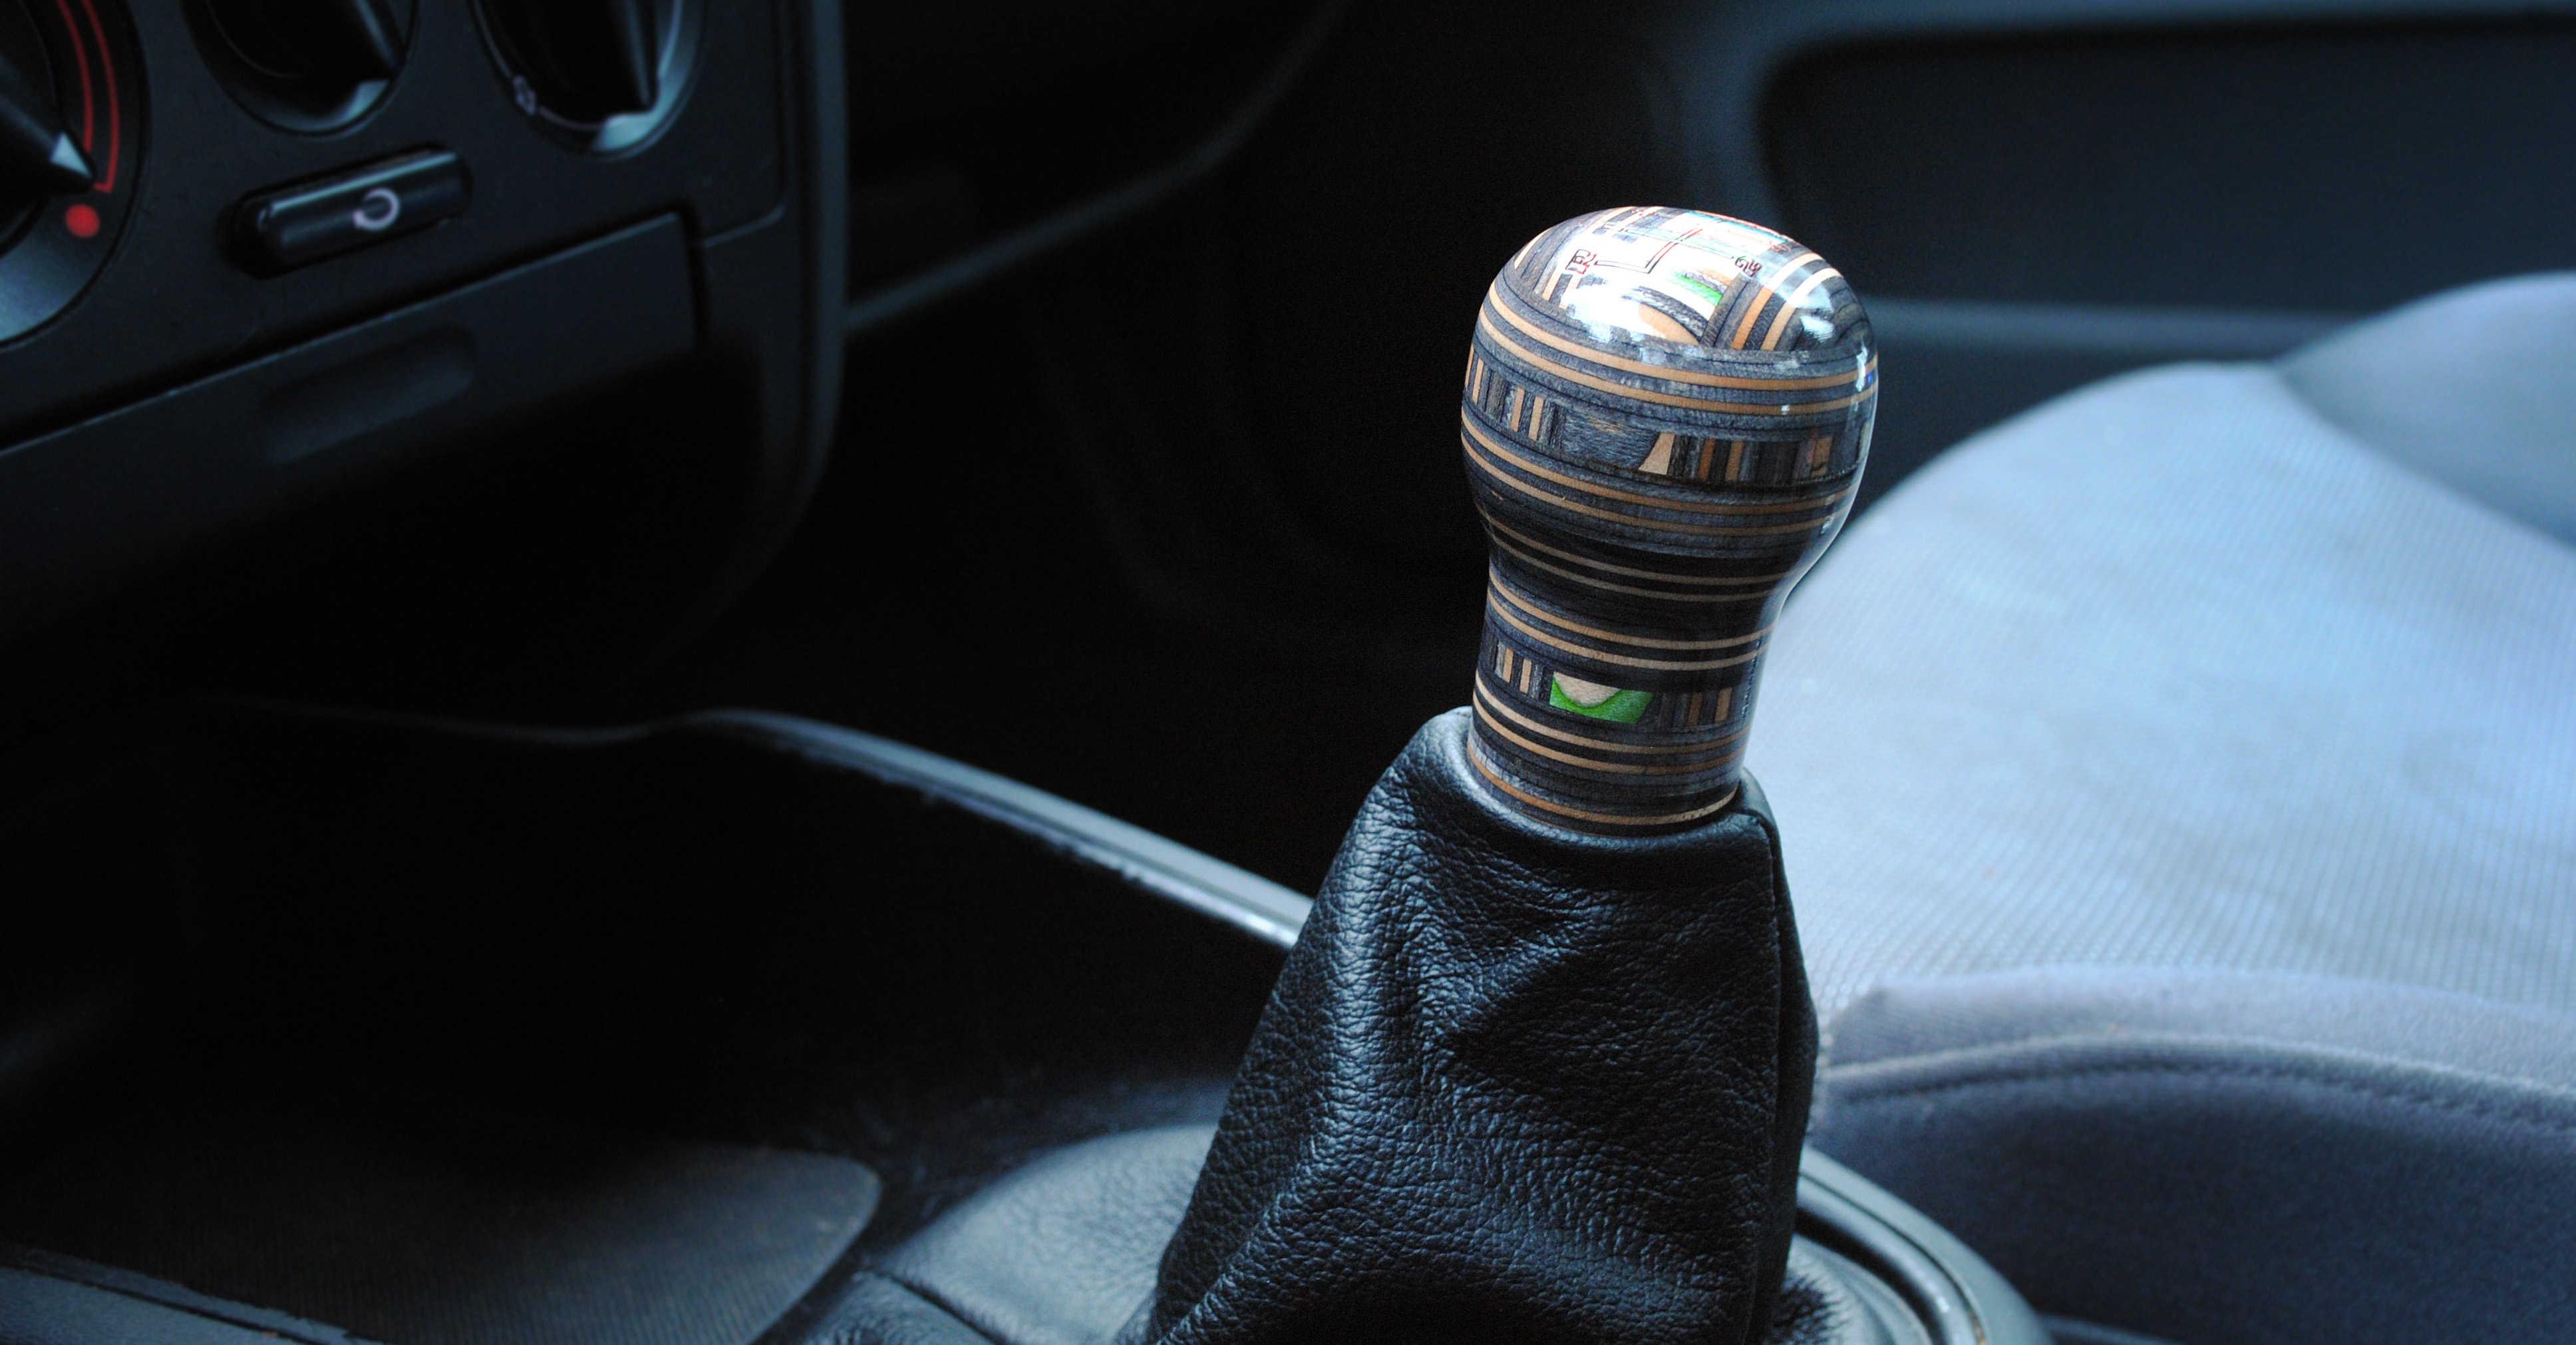 Audi A3 shift knob